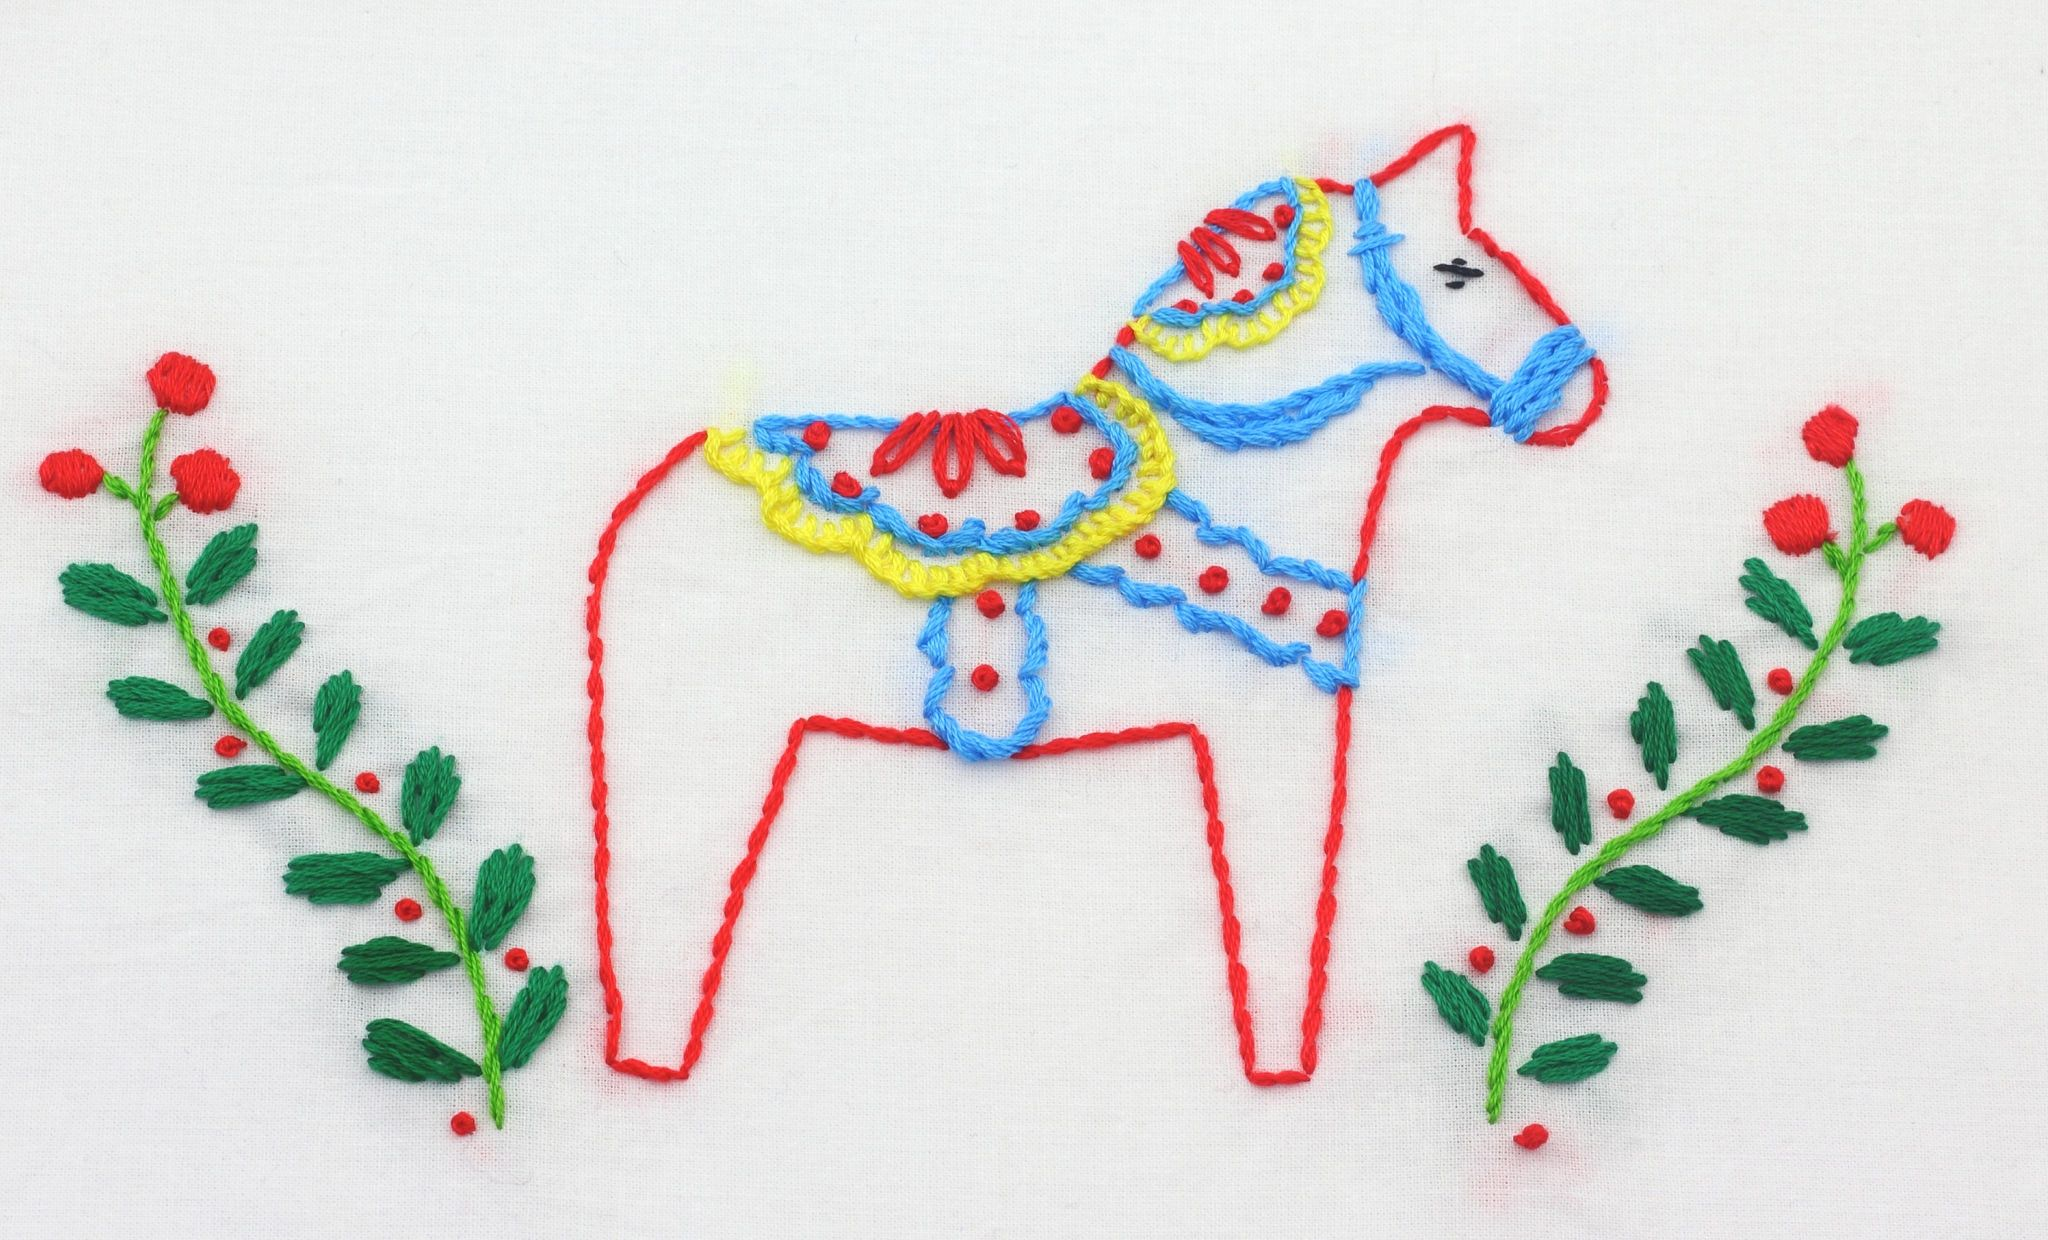 1282015 1 Scandinavian Embroidery Swedish Embroidery Christmas Embroidery